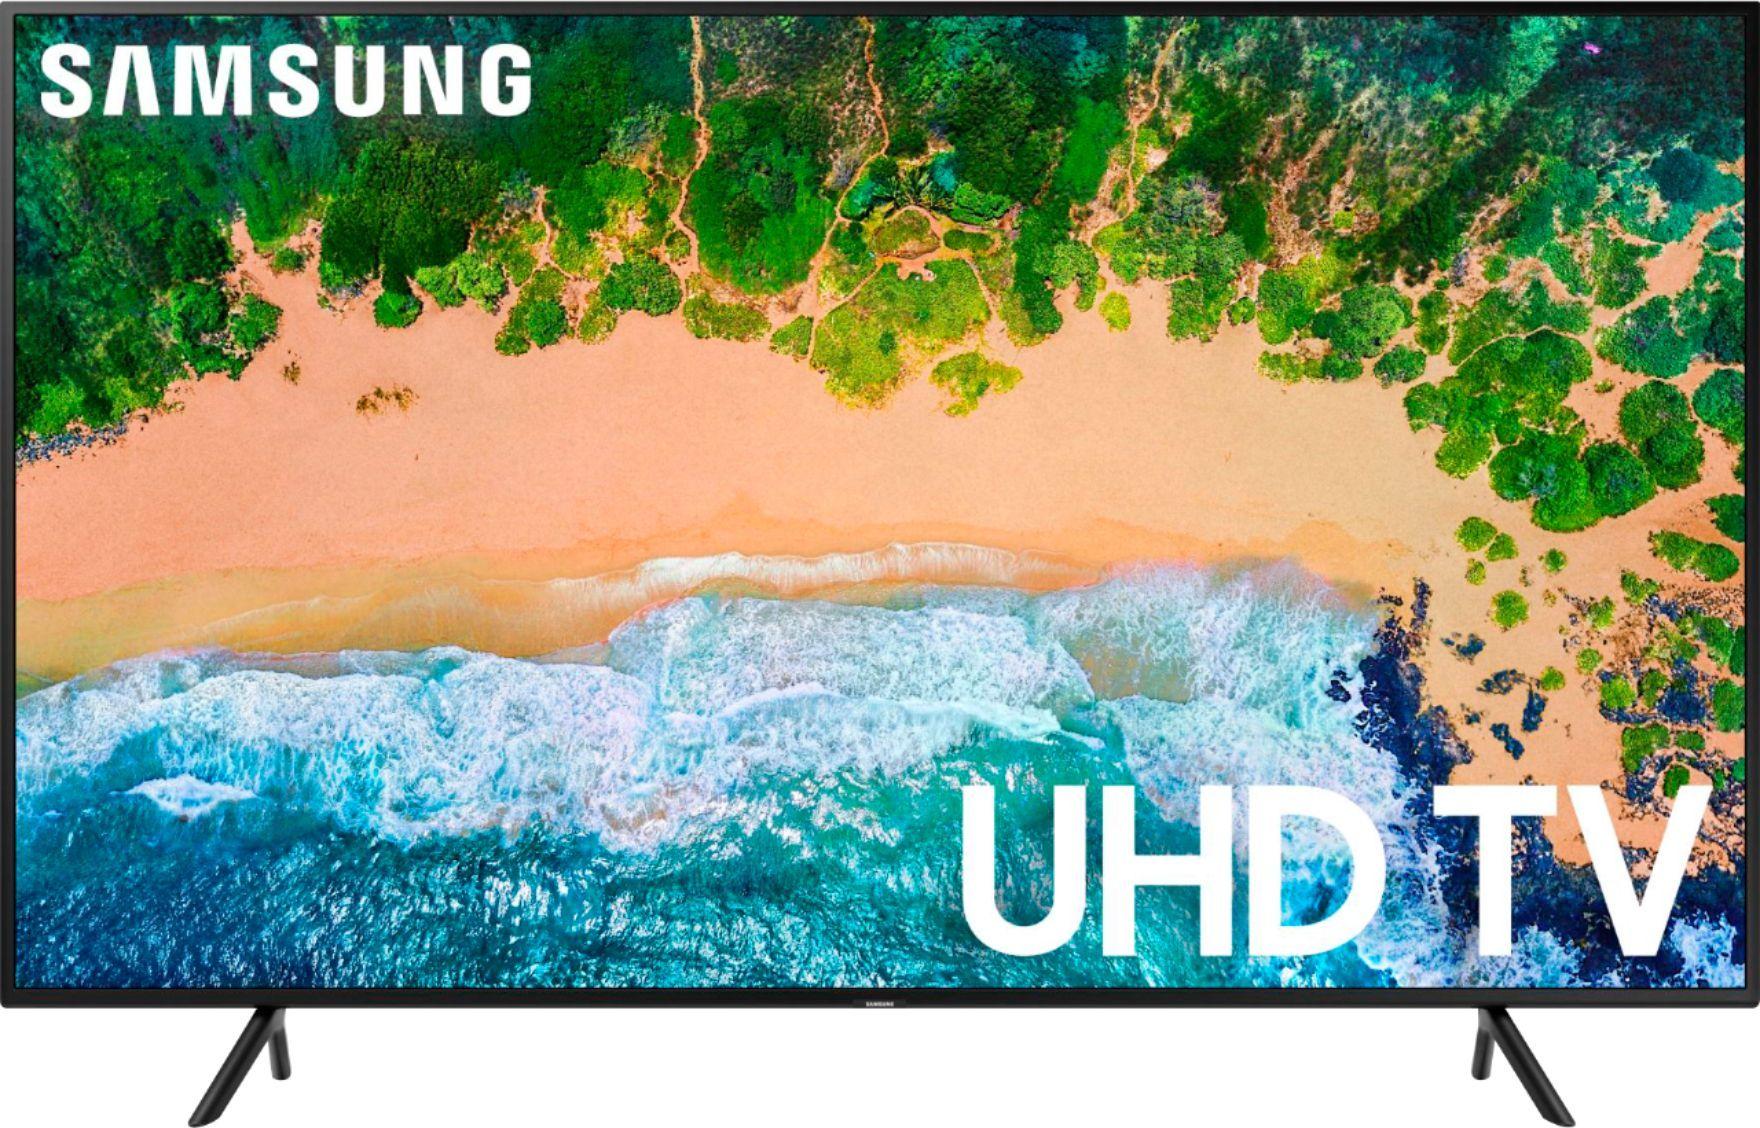 Best Buy Samsung 58 Class Led 6 Series 2160p Smart 4k Uhd Tv With Hdr Un58nu6080fxza Uhd Tv Smart Tv Samsung Smart Tv